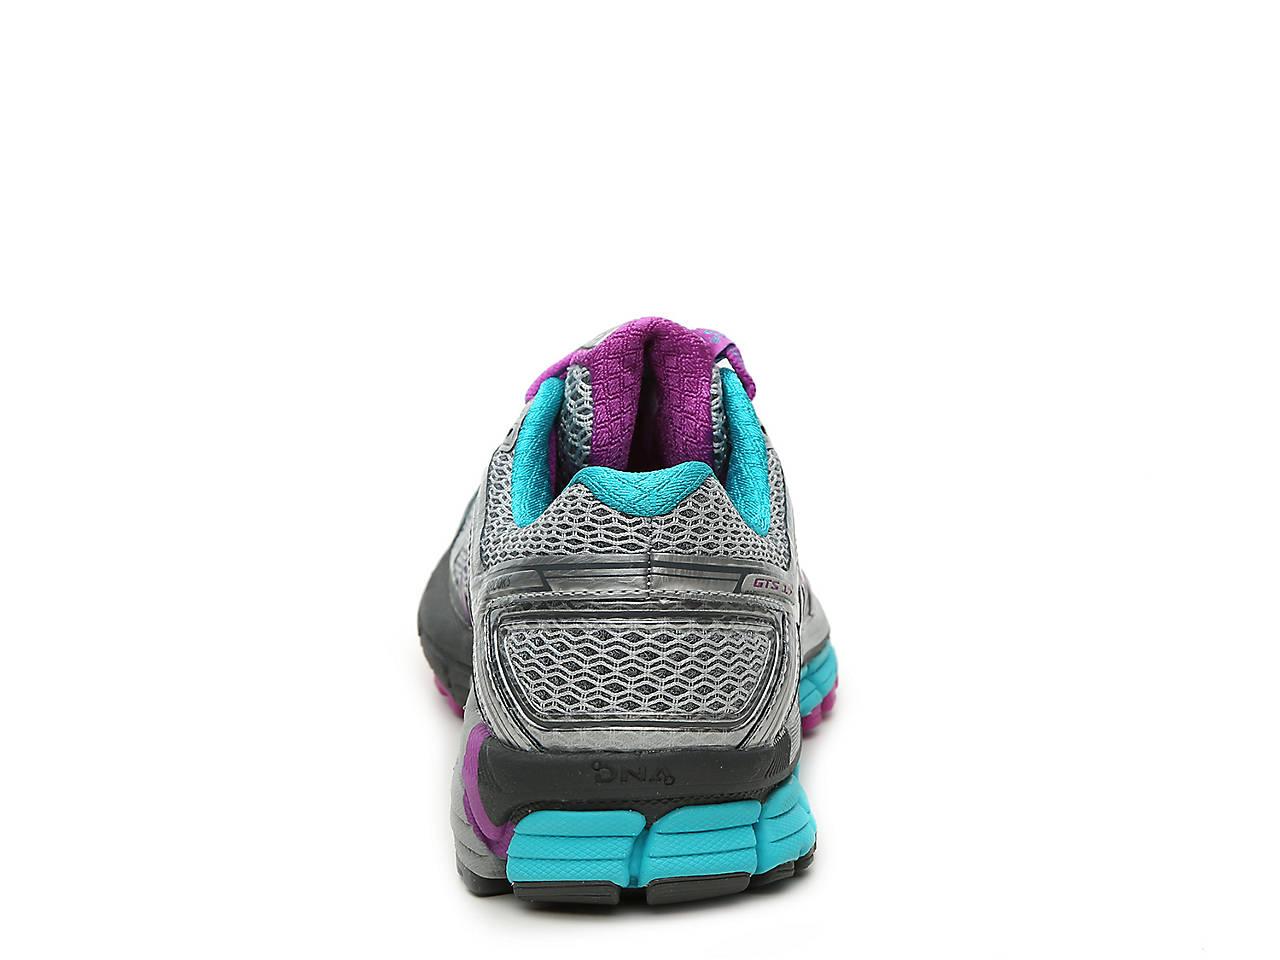 4956ba732cf Brooks Adrenaline GTS 17 Performance Running Shoe - Women s Women s ...